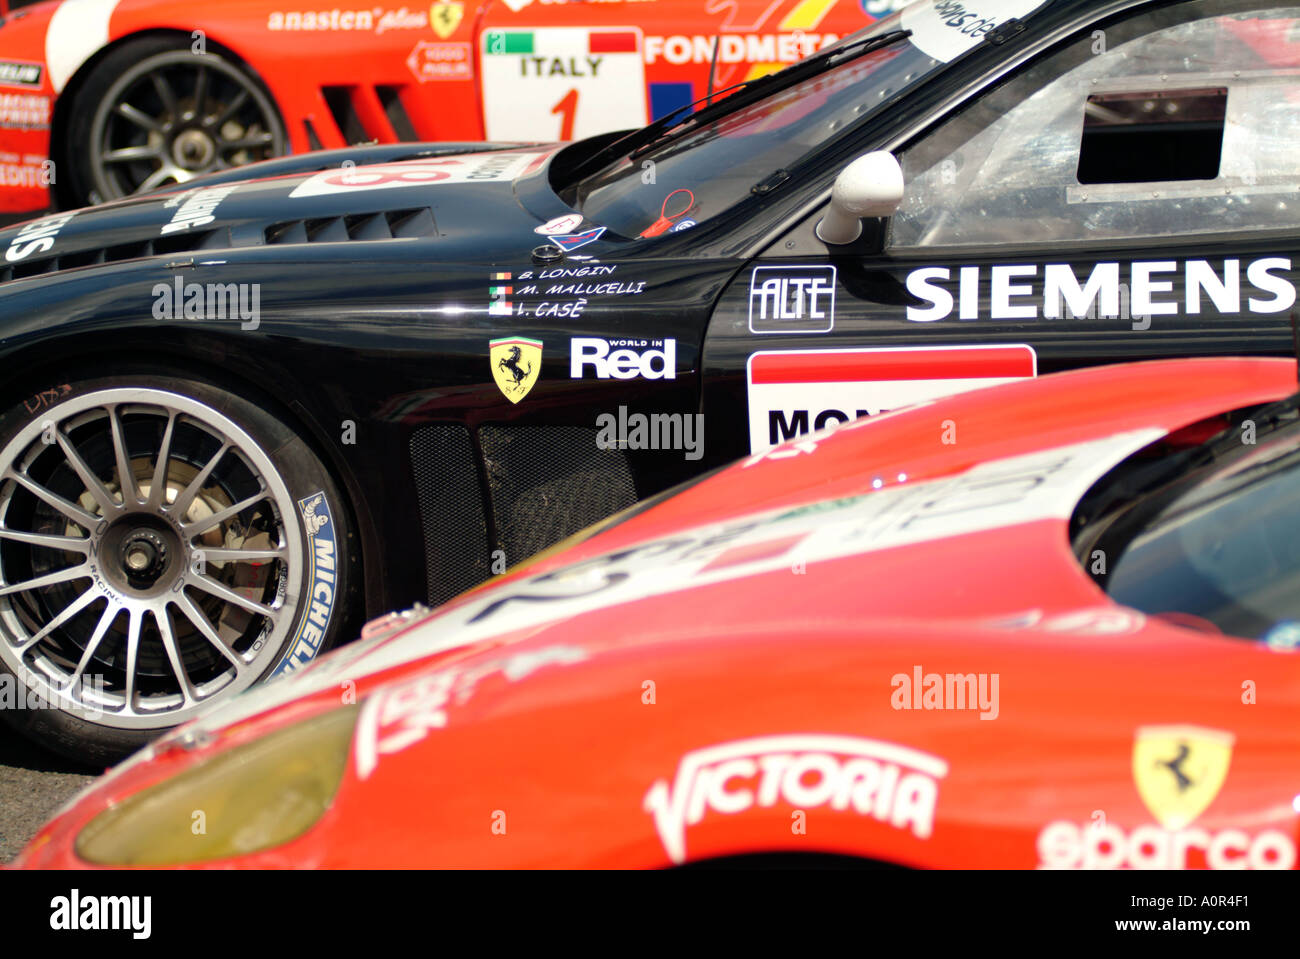 Ferrari Sponsor Advertising Wheel Tyre Slick Racing Car Race Motor Sport  Auto Risk Win Lose Fast Speed Power Prancing Horse